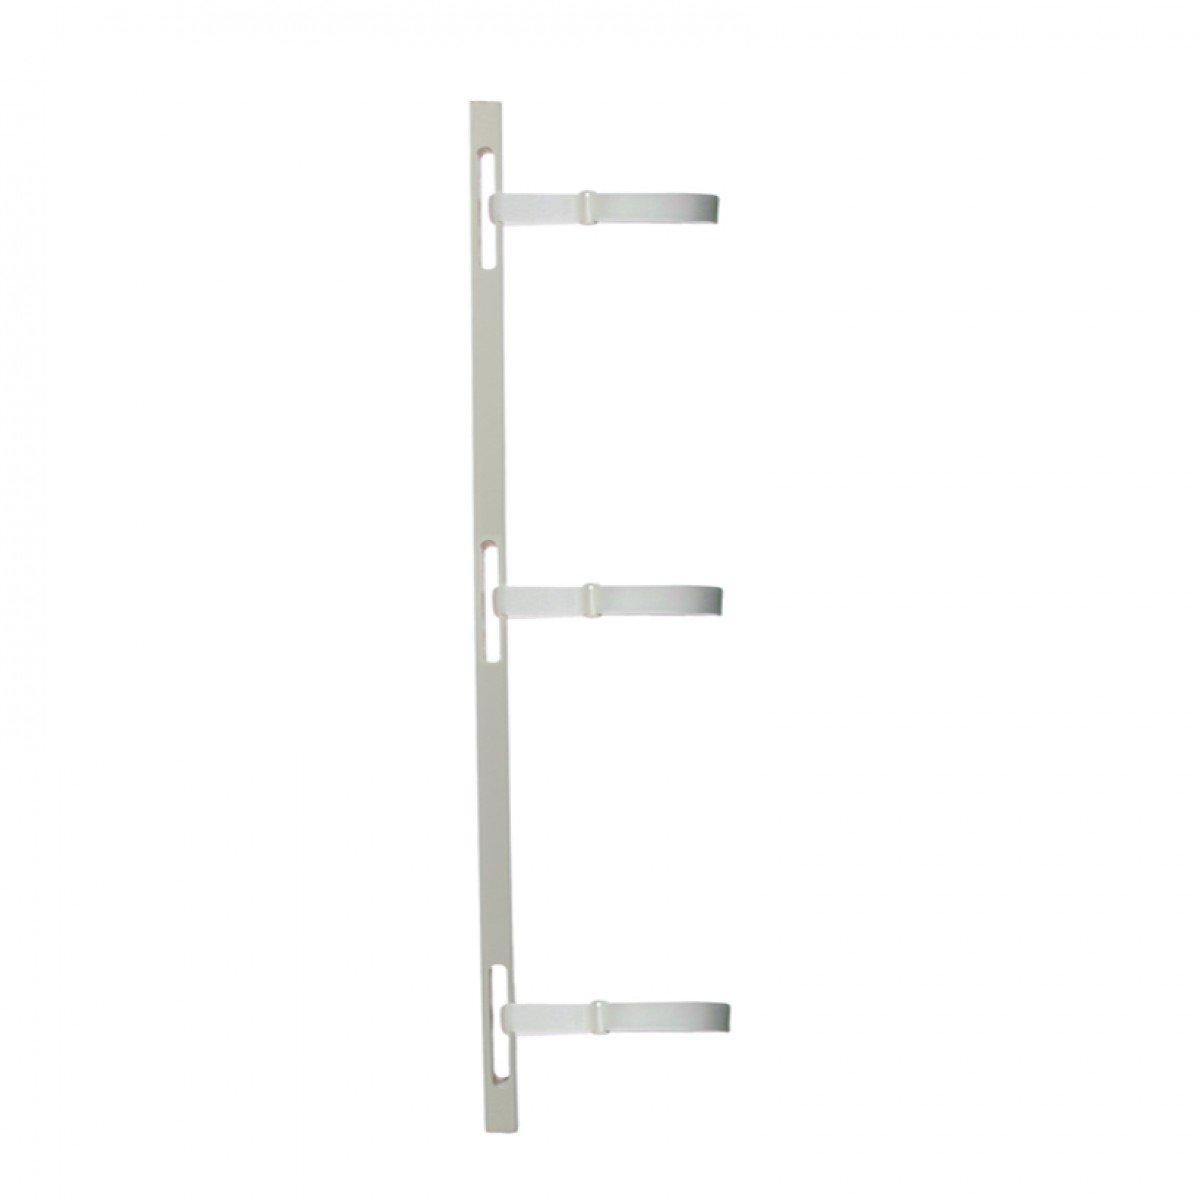 Dreambaby Extra Tall Gate Flat Wall Panel F896 Dreambaby®